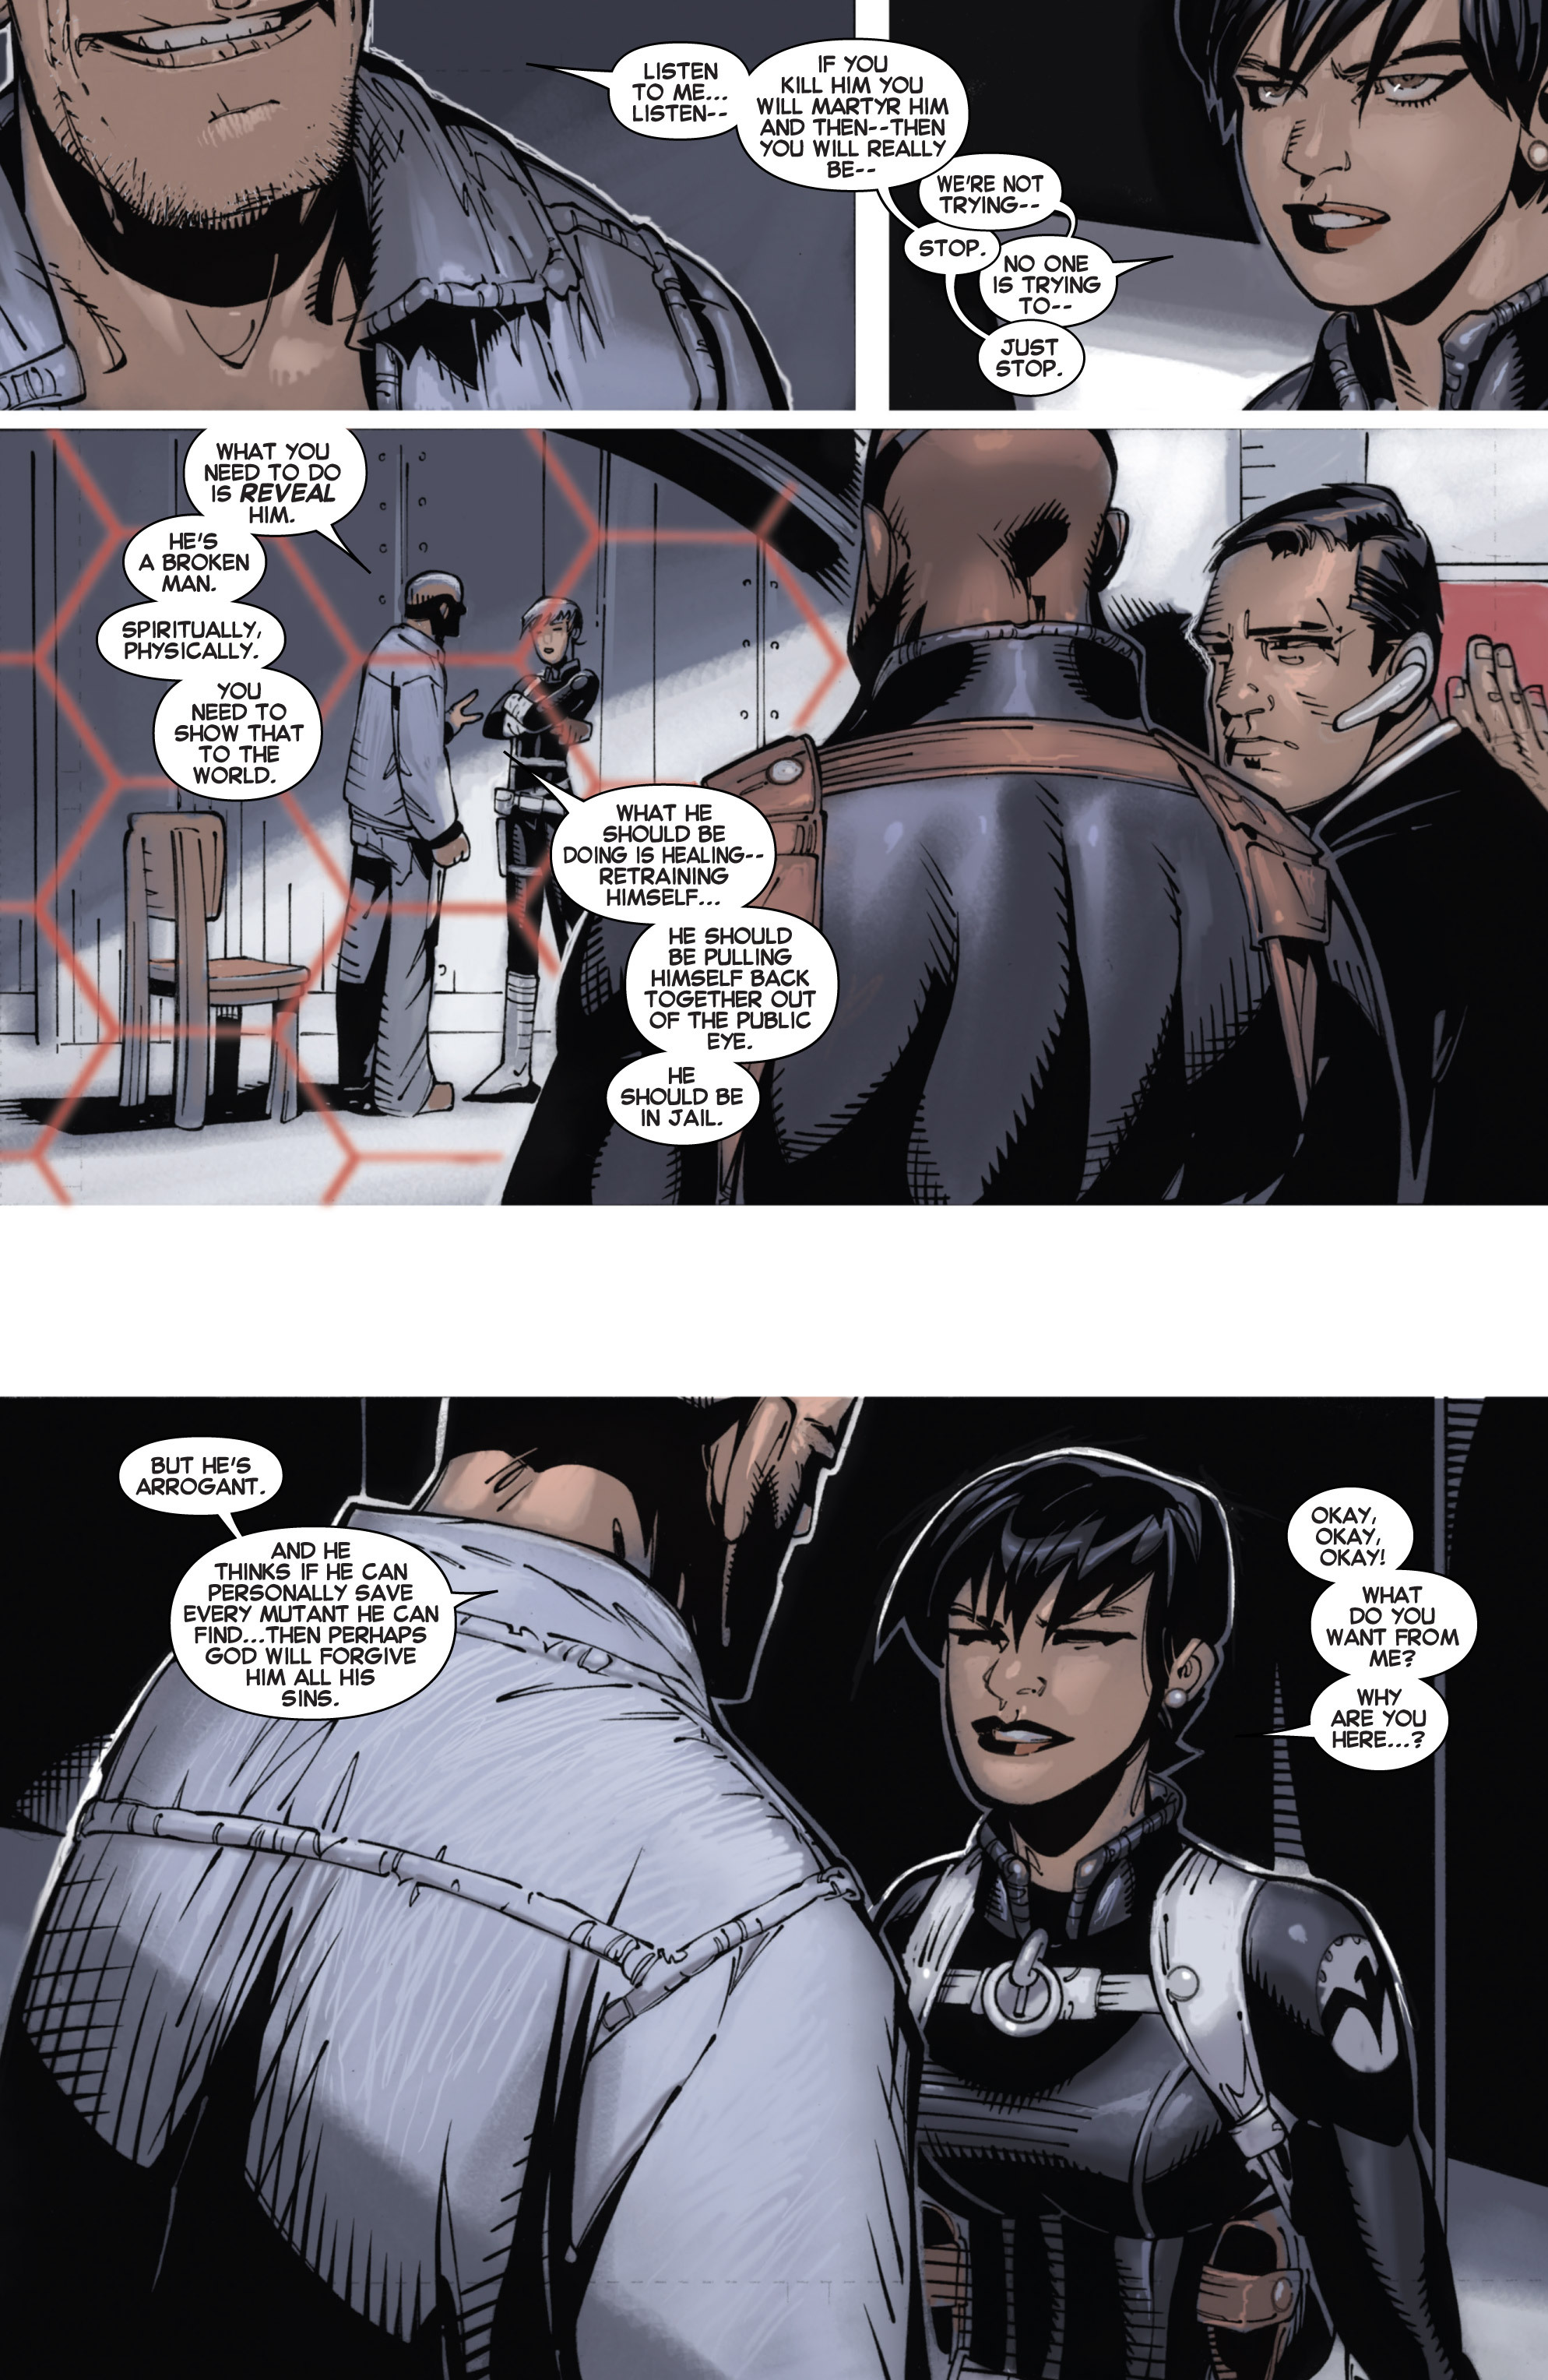 Read online Uncanny X-Men (2013) comic -  Issue # _TPB 1 - Revolution - 20